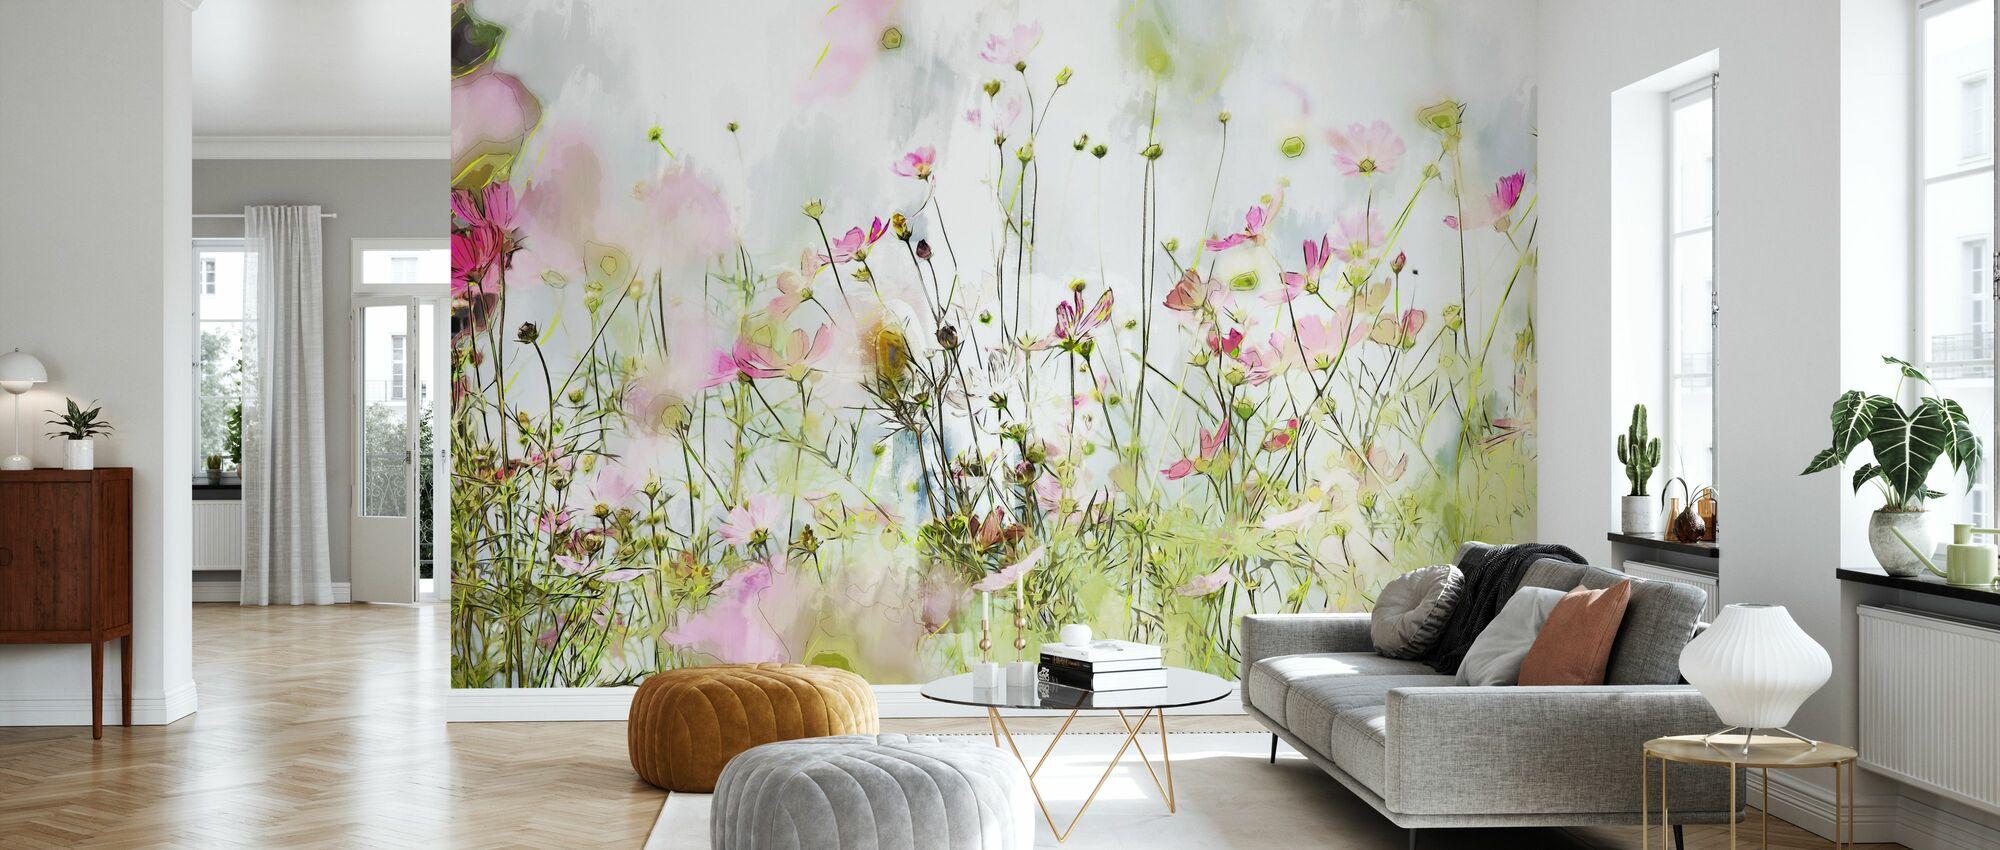 Painting of Cosmos Flower II - Wallpaper - Living Room